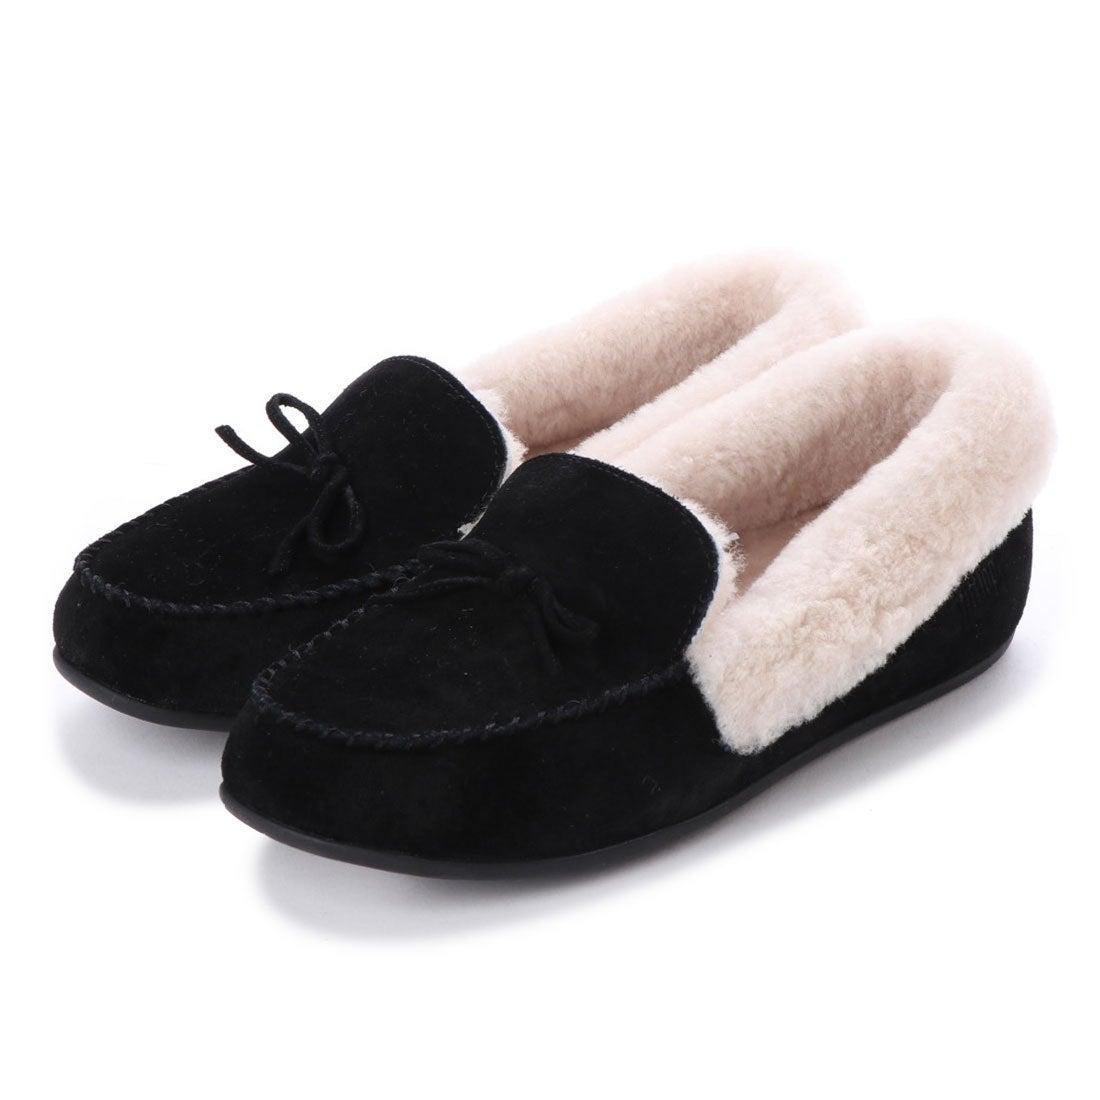 ca5cbe4ddb55 fitflop フィットフロップ FitFlop CLARA SHEARLING MOCCASIN (Black) -靴&ファッション通販  ロコンド〜自宅で試着、気軽に返品